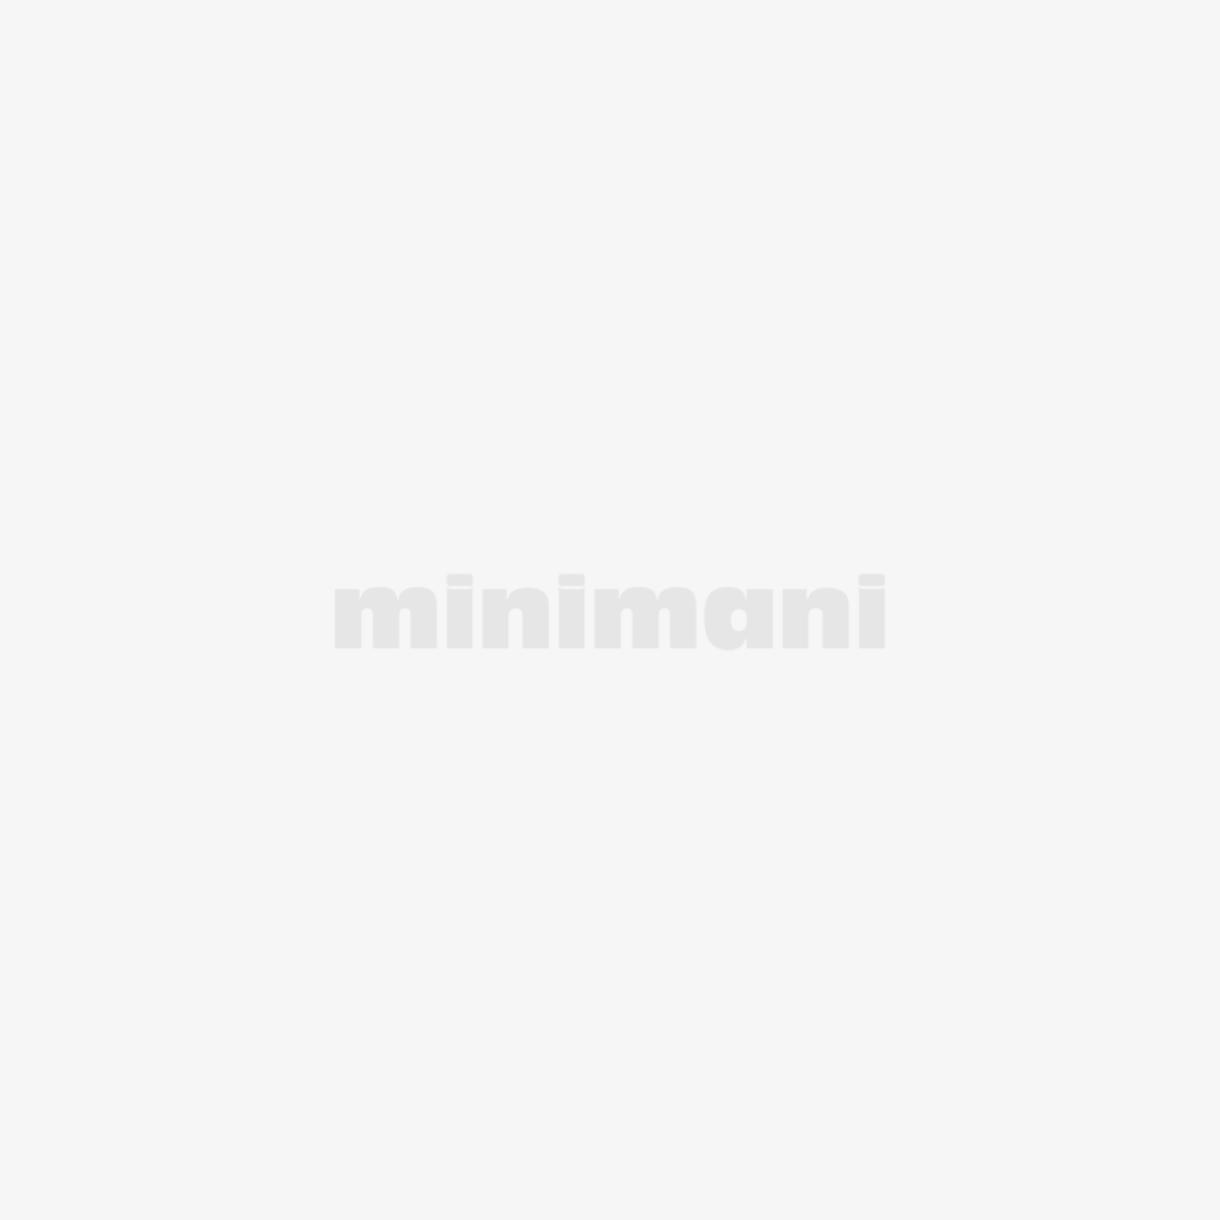 Airam Milja 10 led-lankapallot pastelli